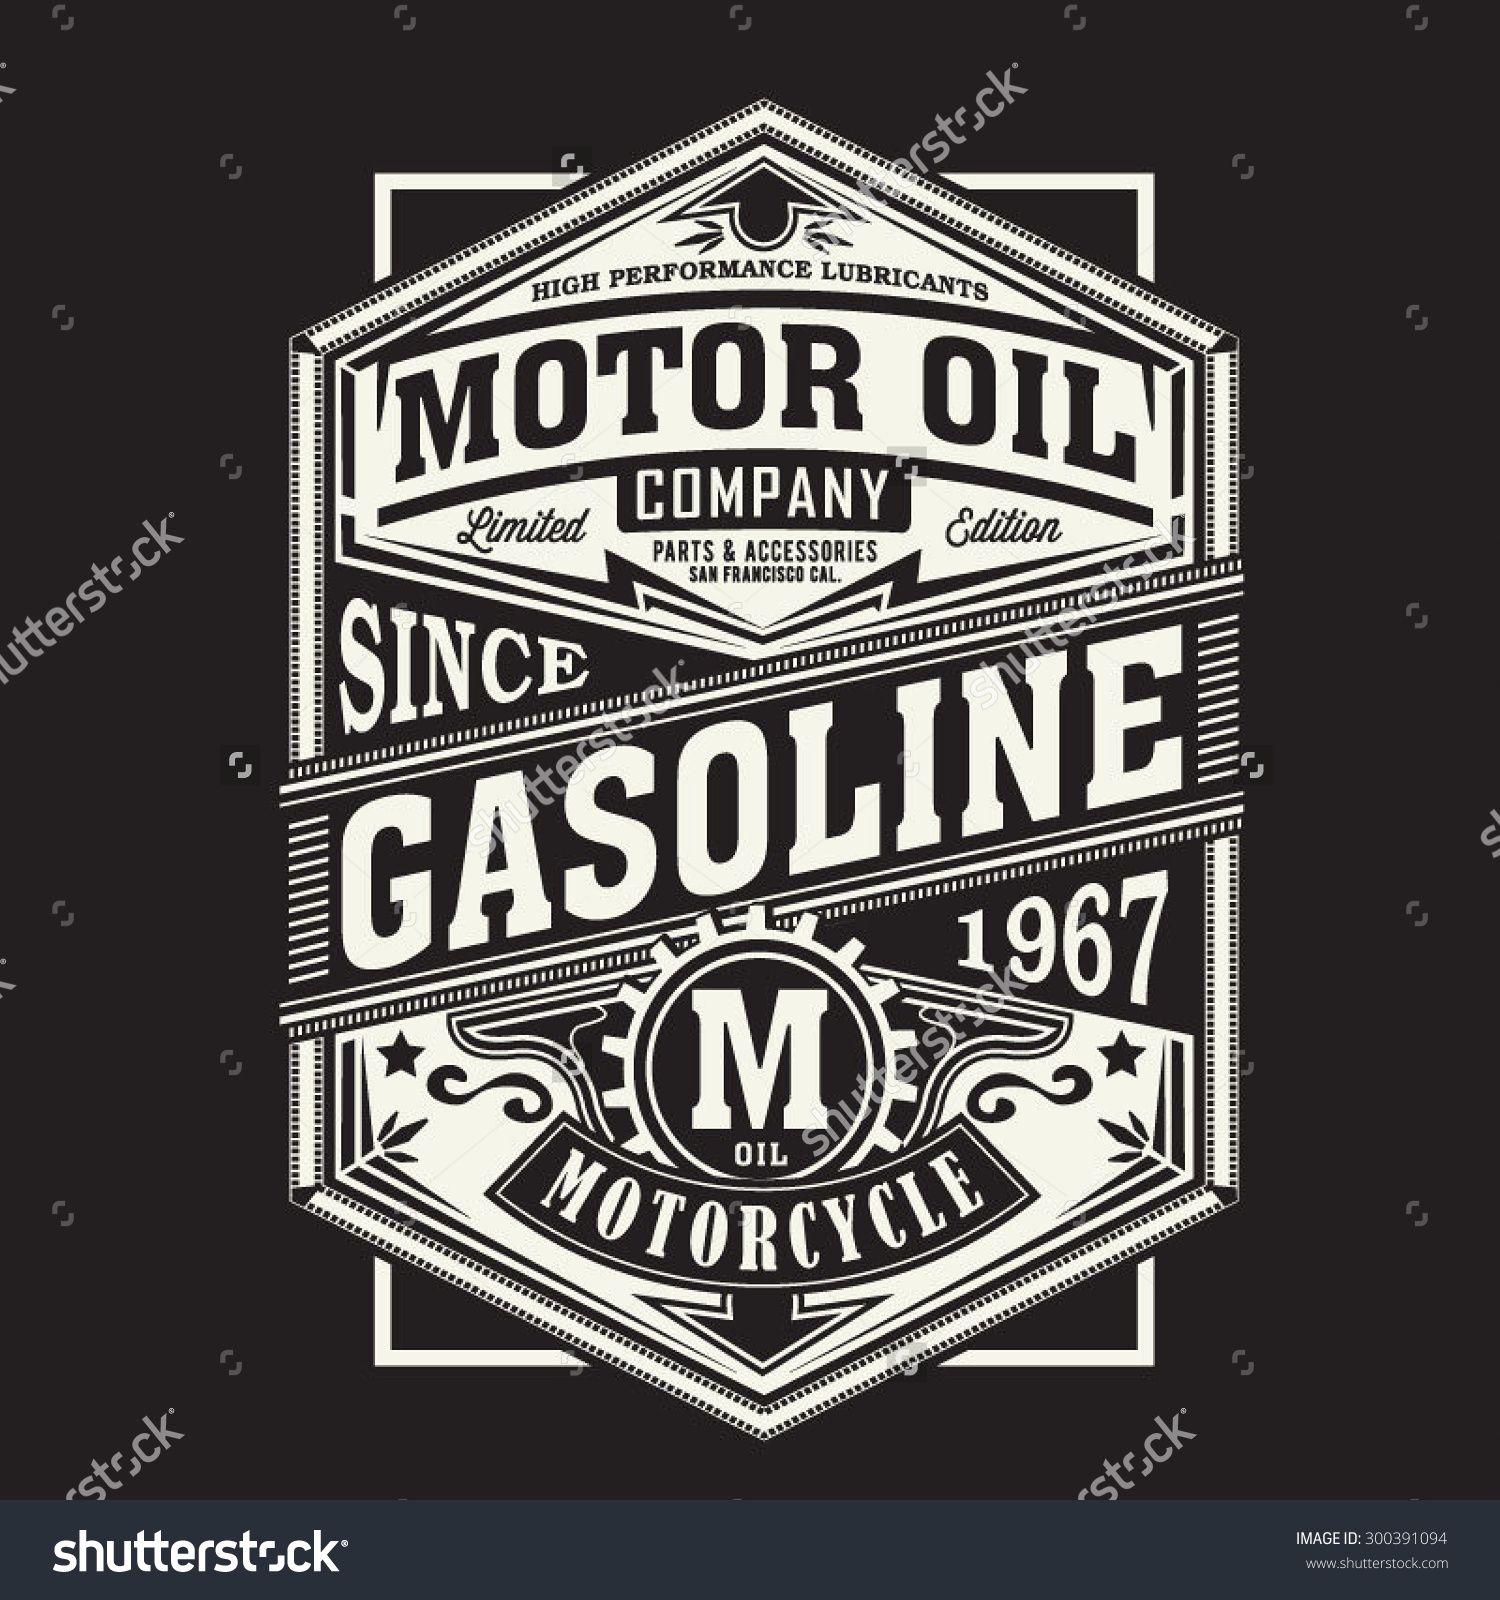 Design t shirt motor - Stock Vector Motor Gasoline Typography T Shirt Graphics